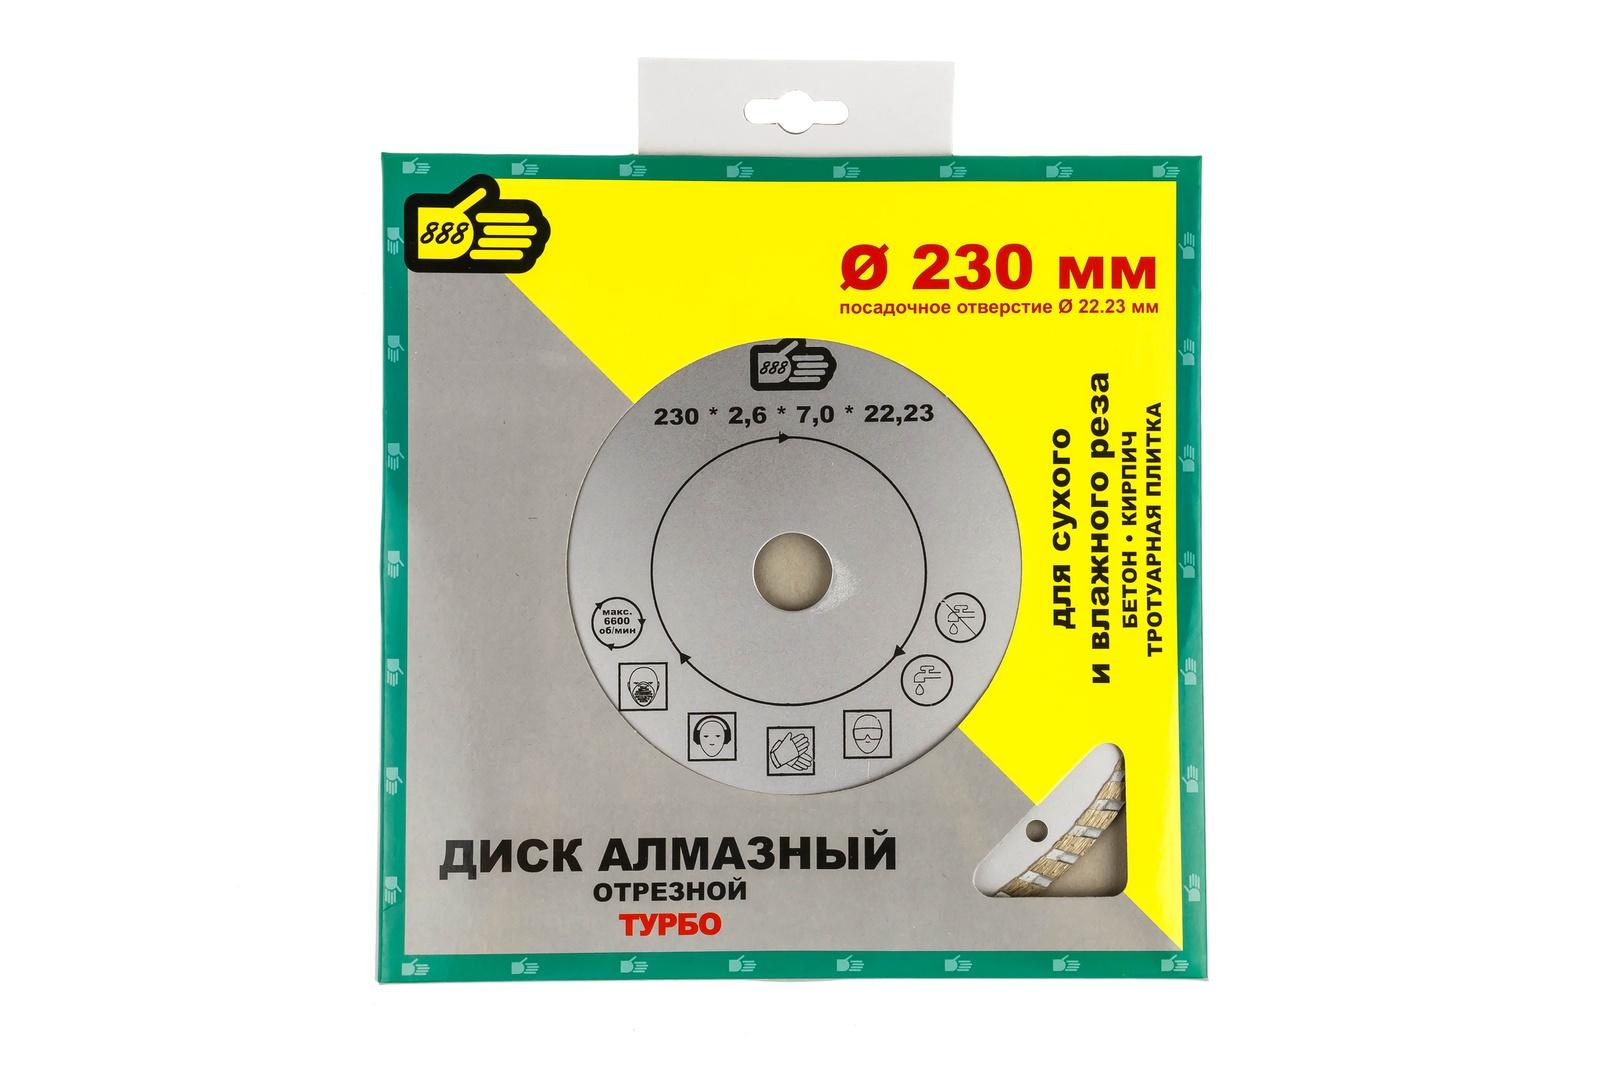 Диск алмазный Турбо, 888, 230 х 2,6 х 22 мм. диск алмазный vira турбо наружный диаметр 230 мм 593230